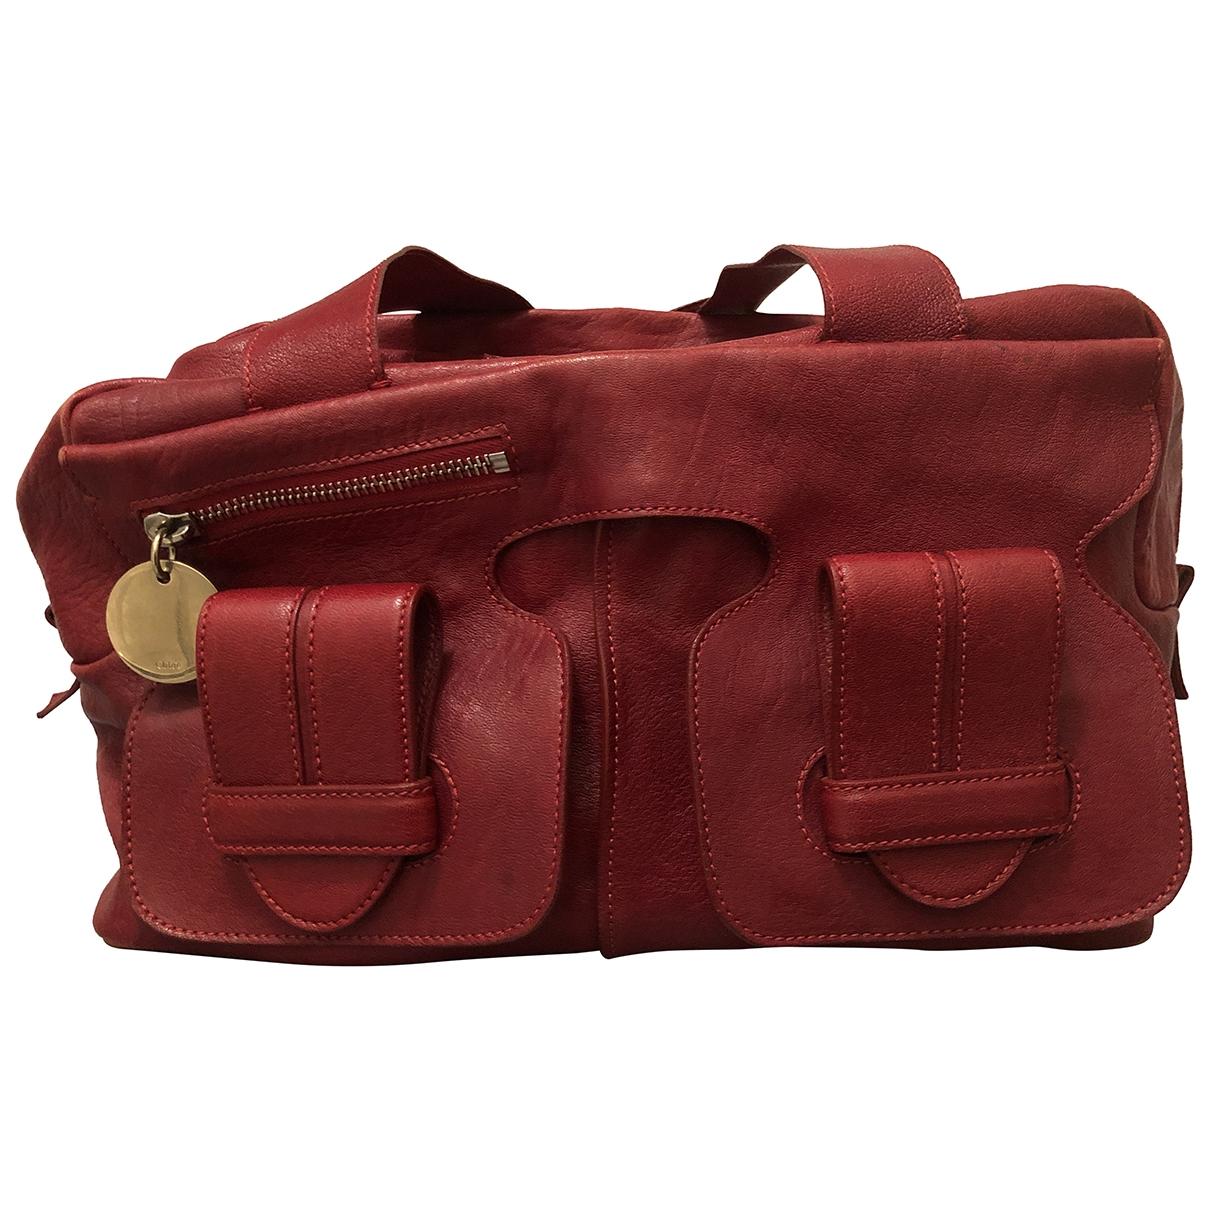 Chloé \N Red Leather handbag for Women \N